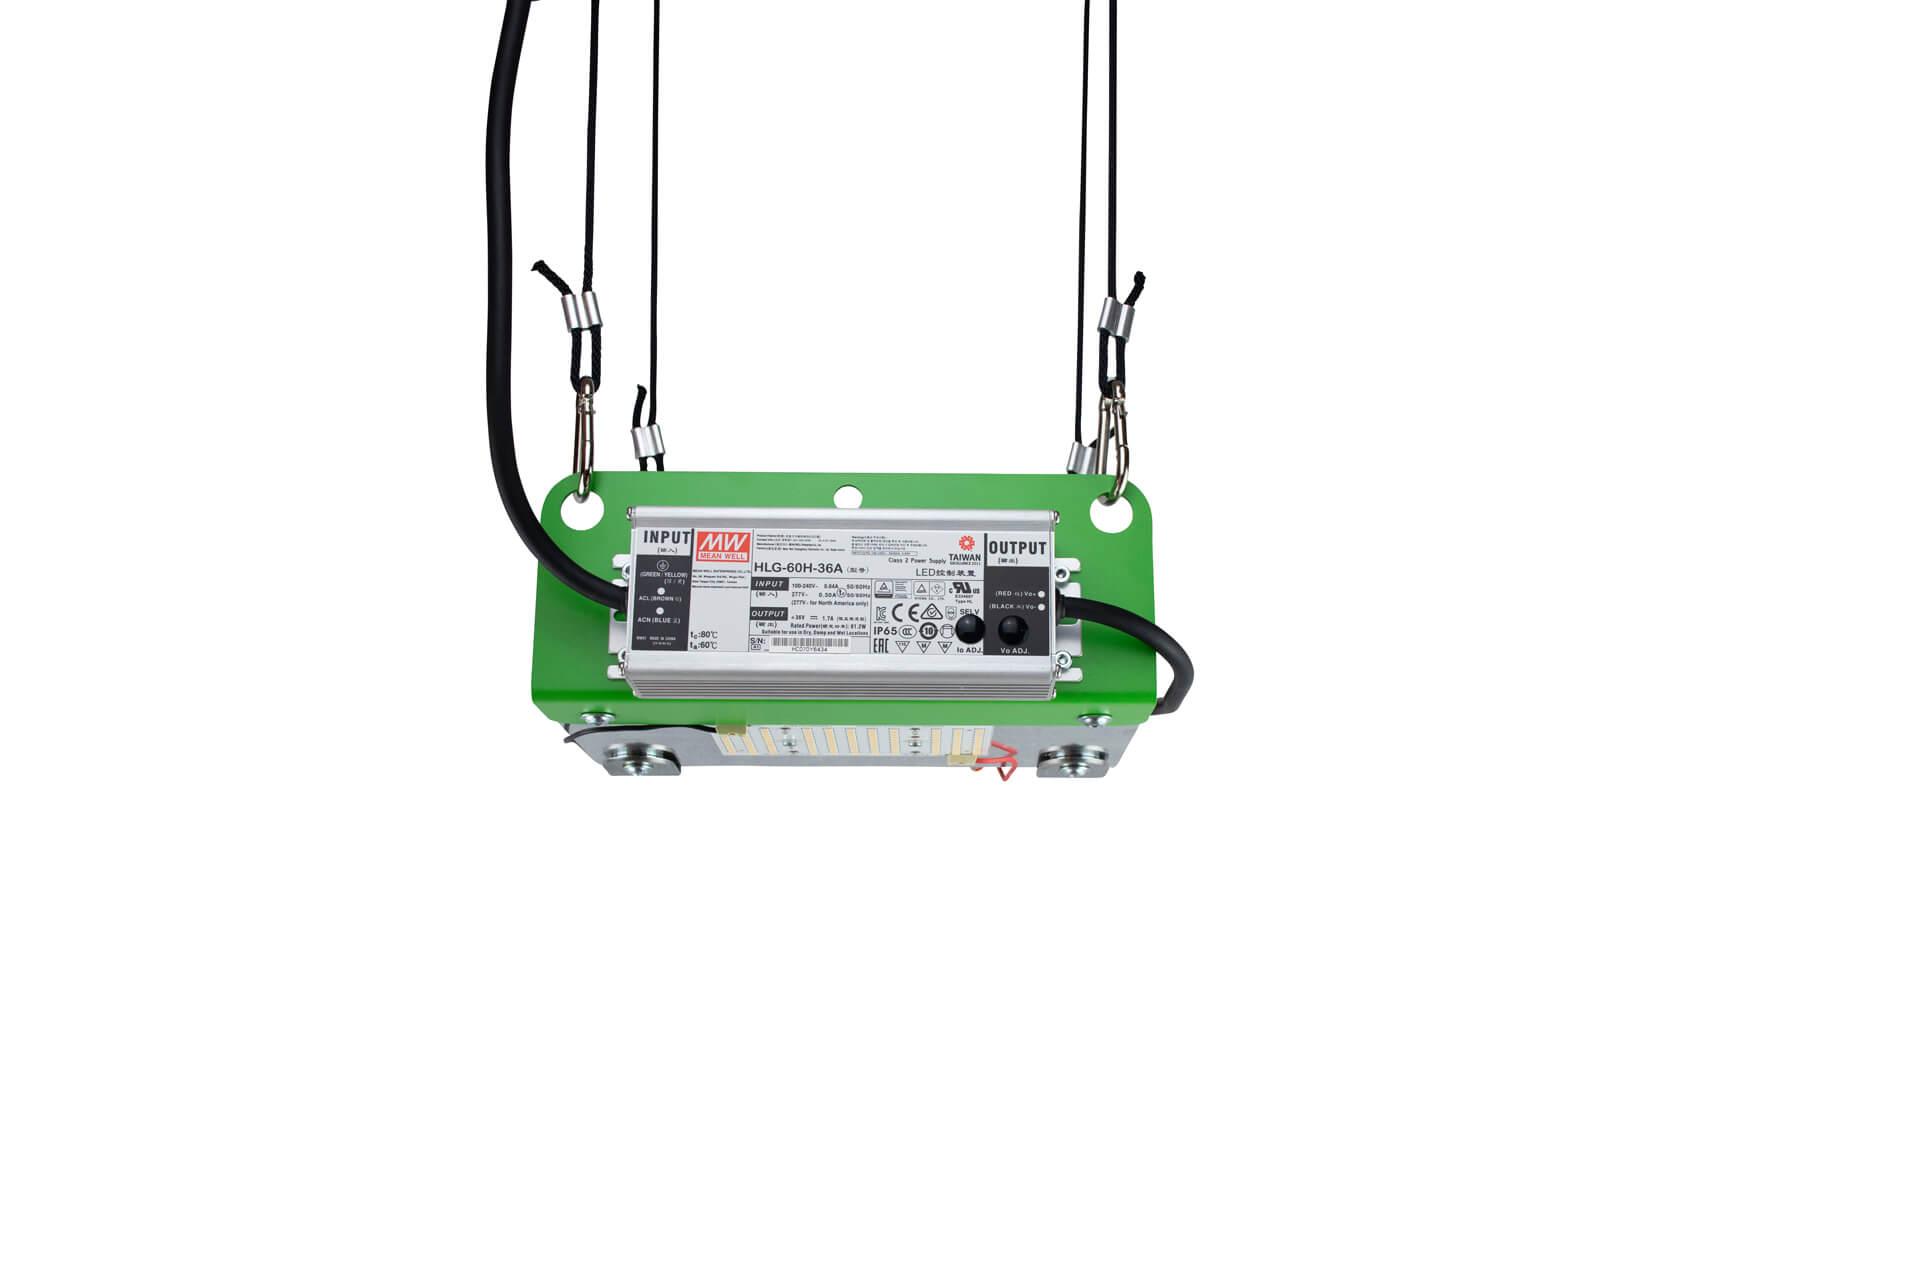 DIY-M-KIT-SMD-60w-down-off-pro-emit-onlineshop